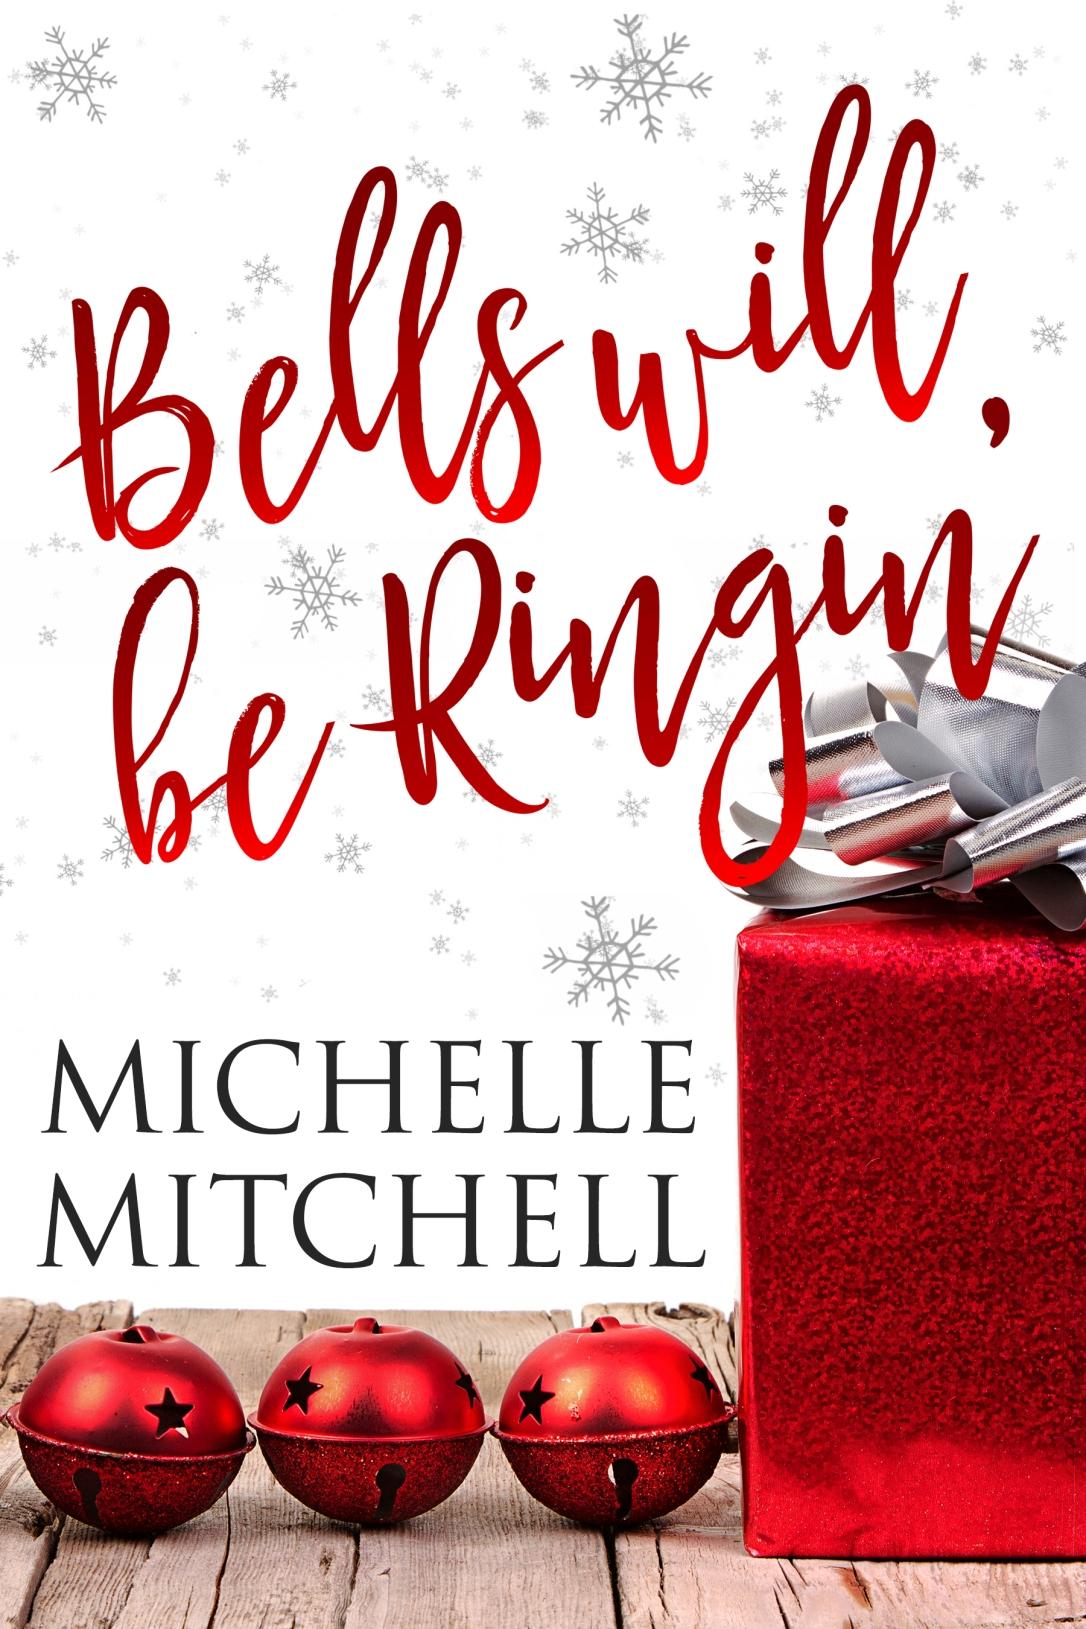 MichelleMitchell_BellsWillBeRingin_ECoverB (2)